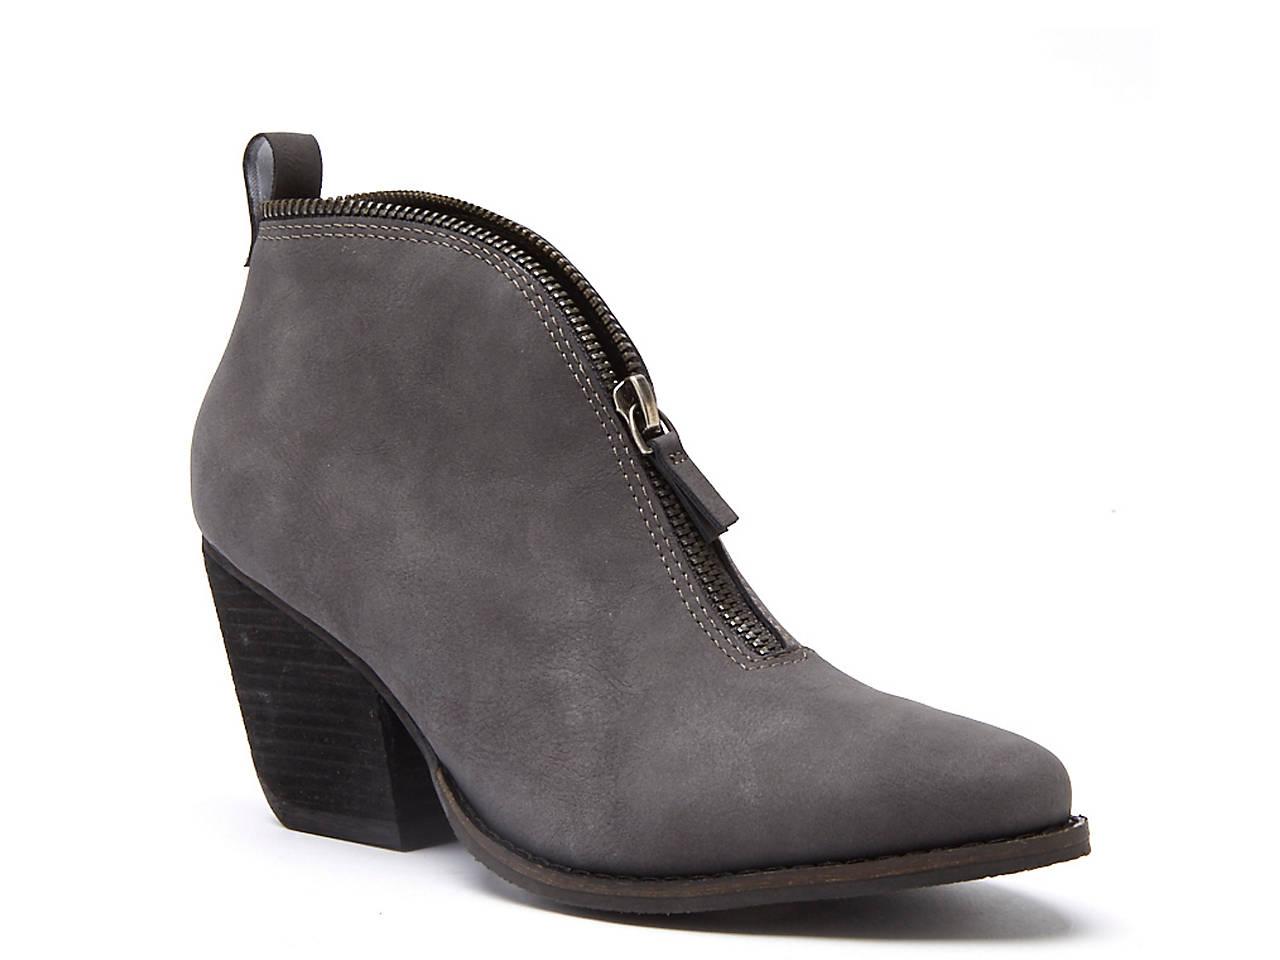 Women's Leather Bootie